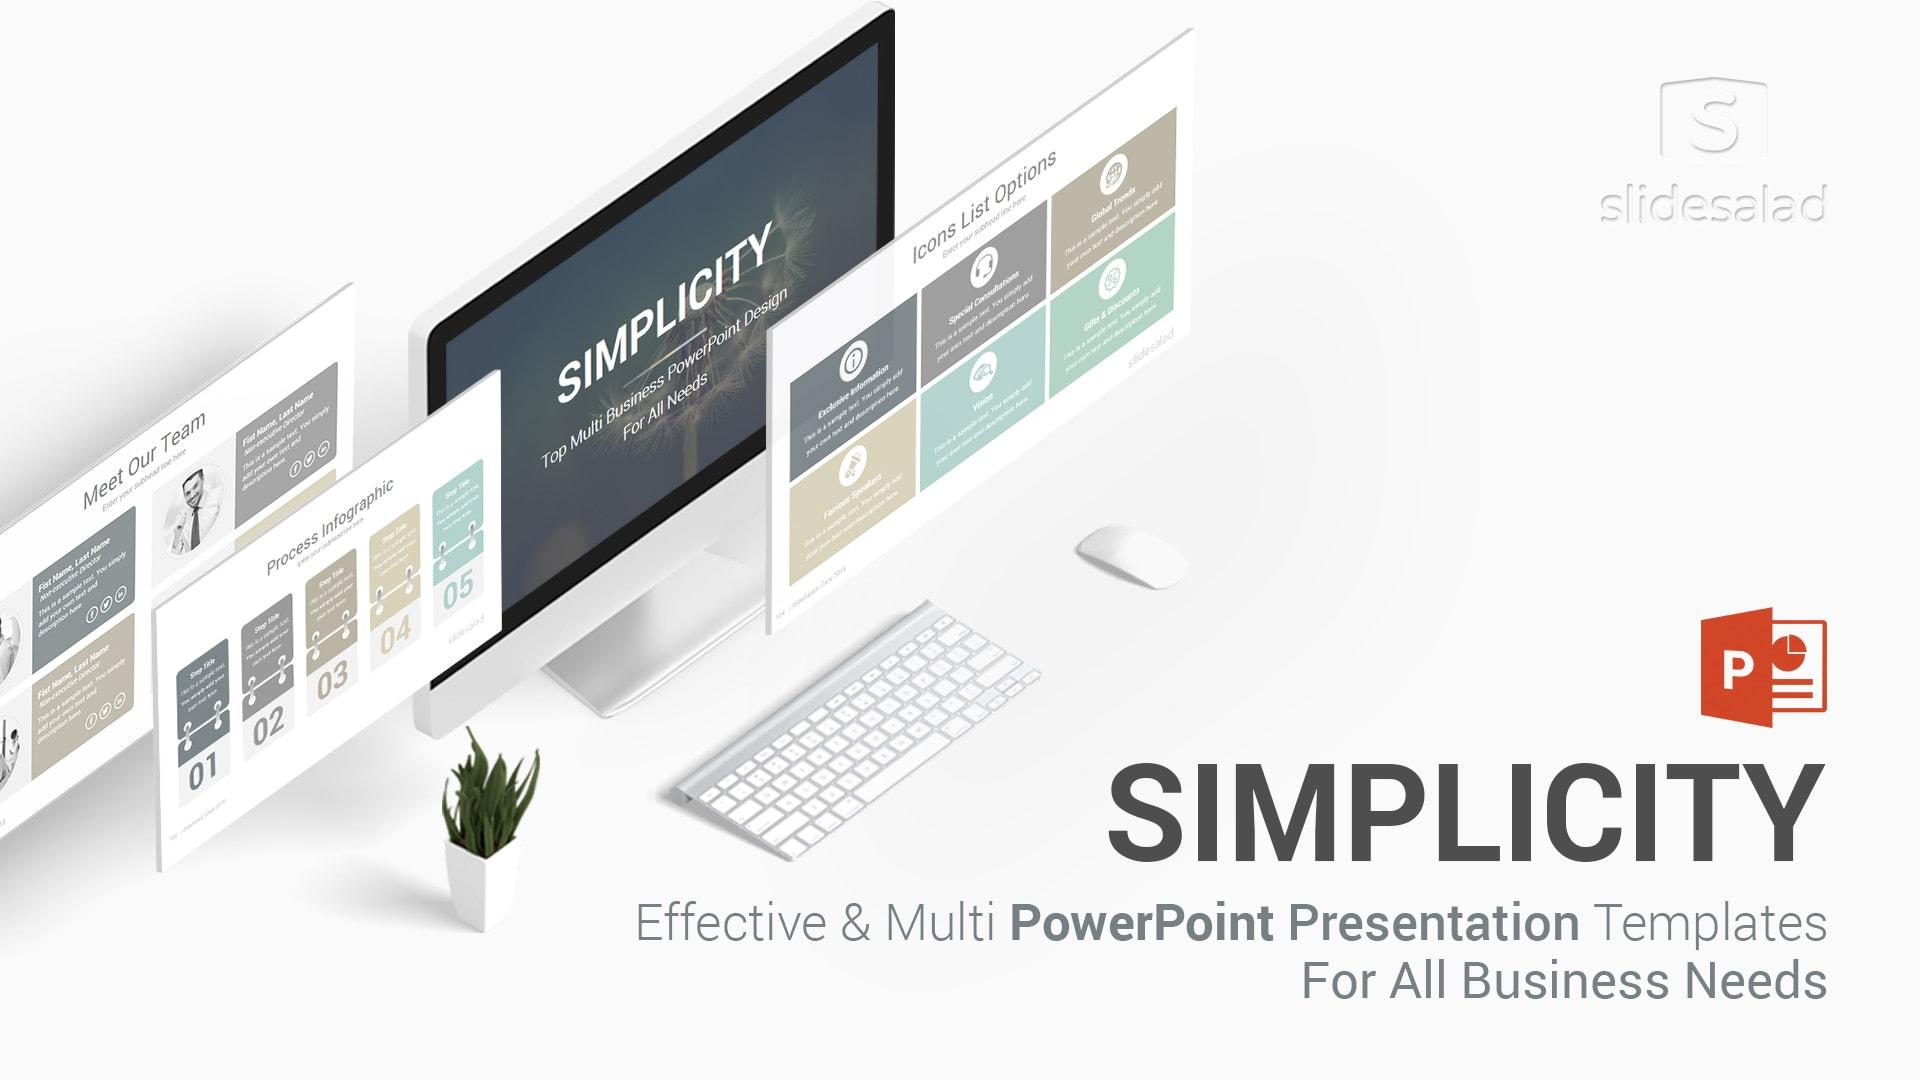 Simplicity Professional Business PowerPoint Templates – Best Modern PPT Presentation